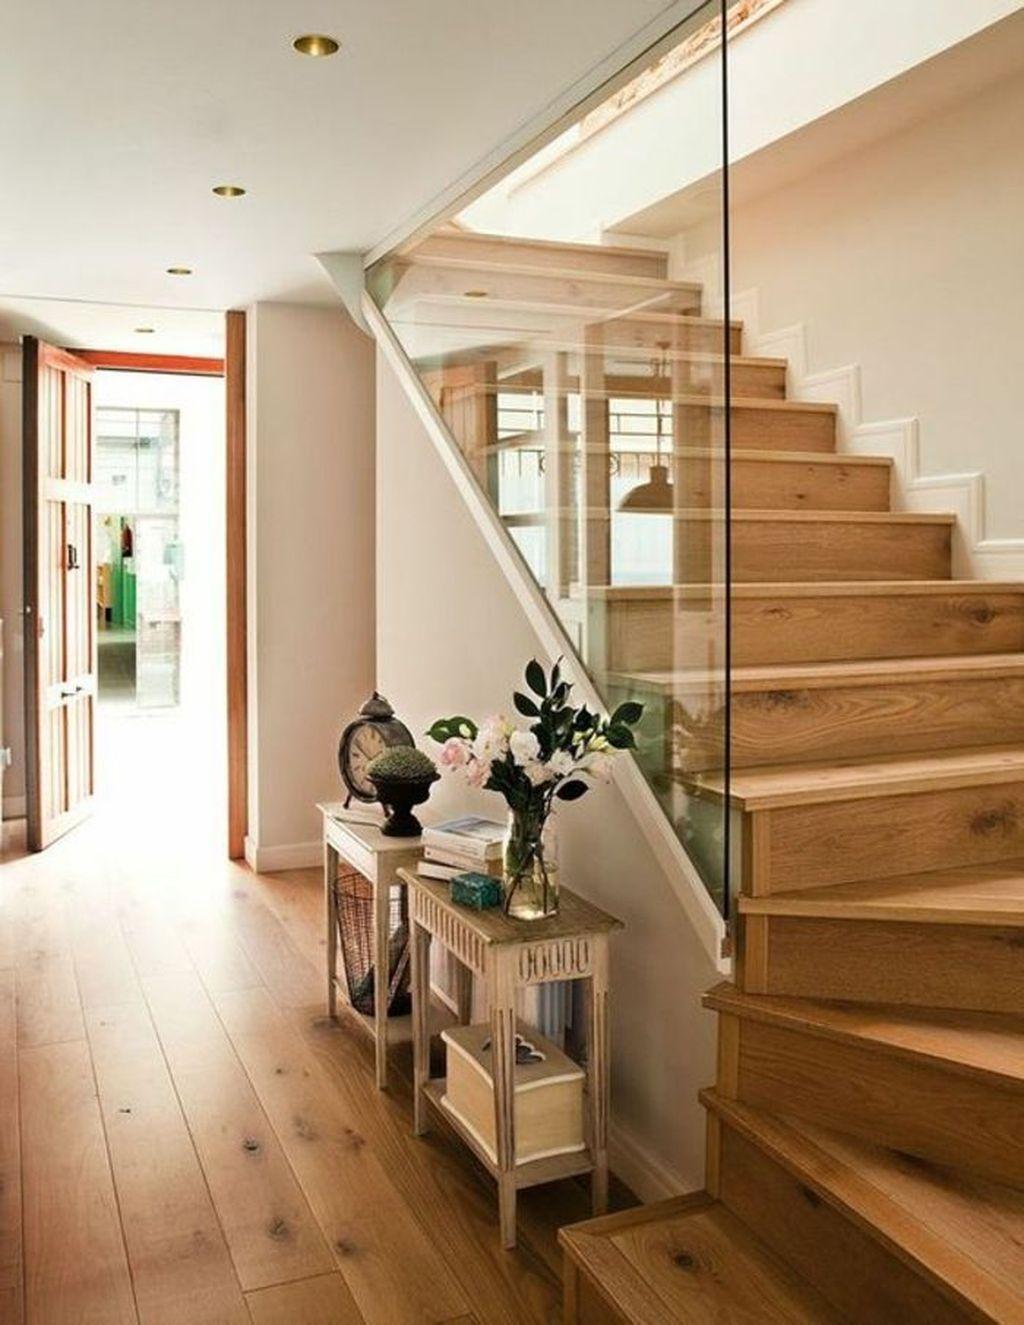 43 Affordable Glass Staircase Design Ideas #staircaseideas